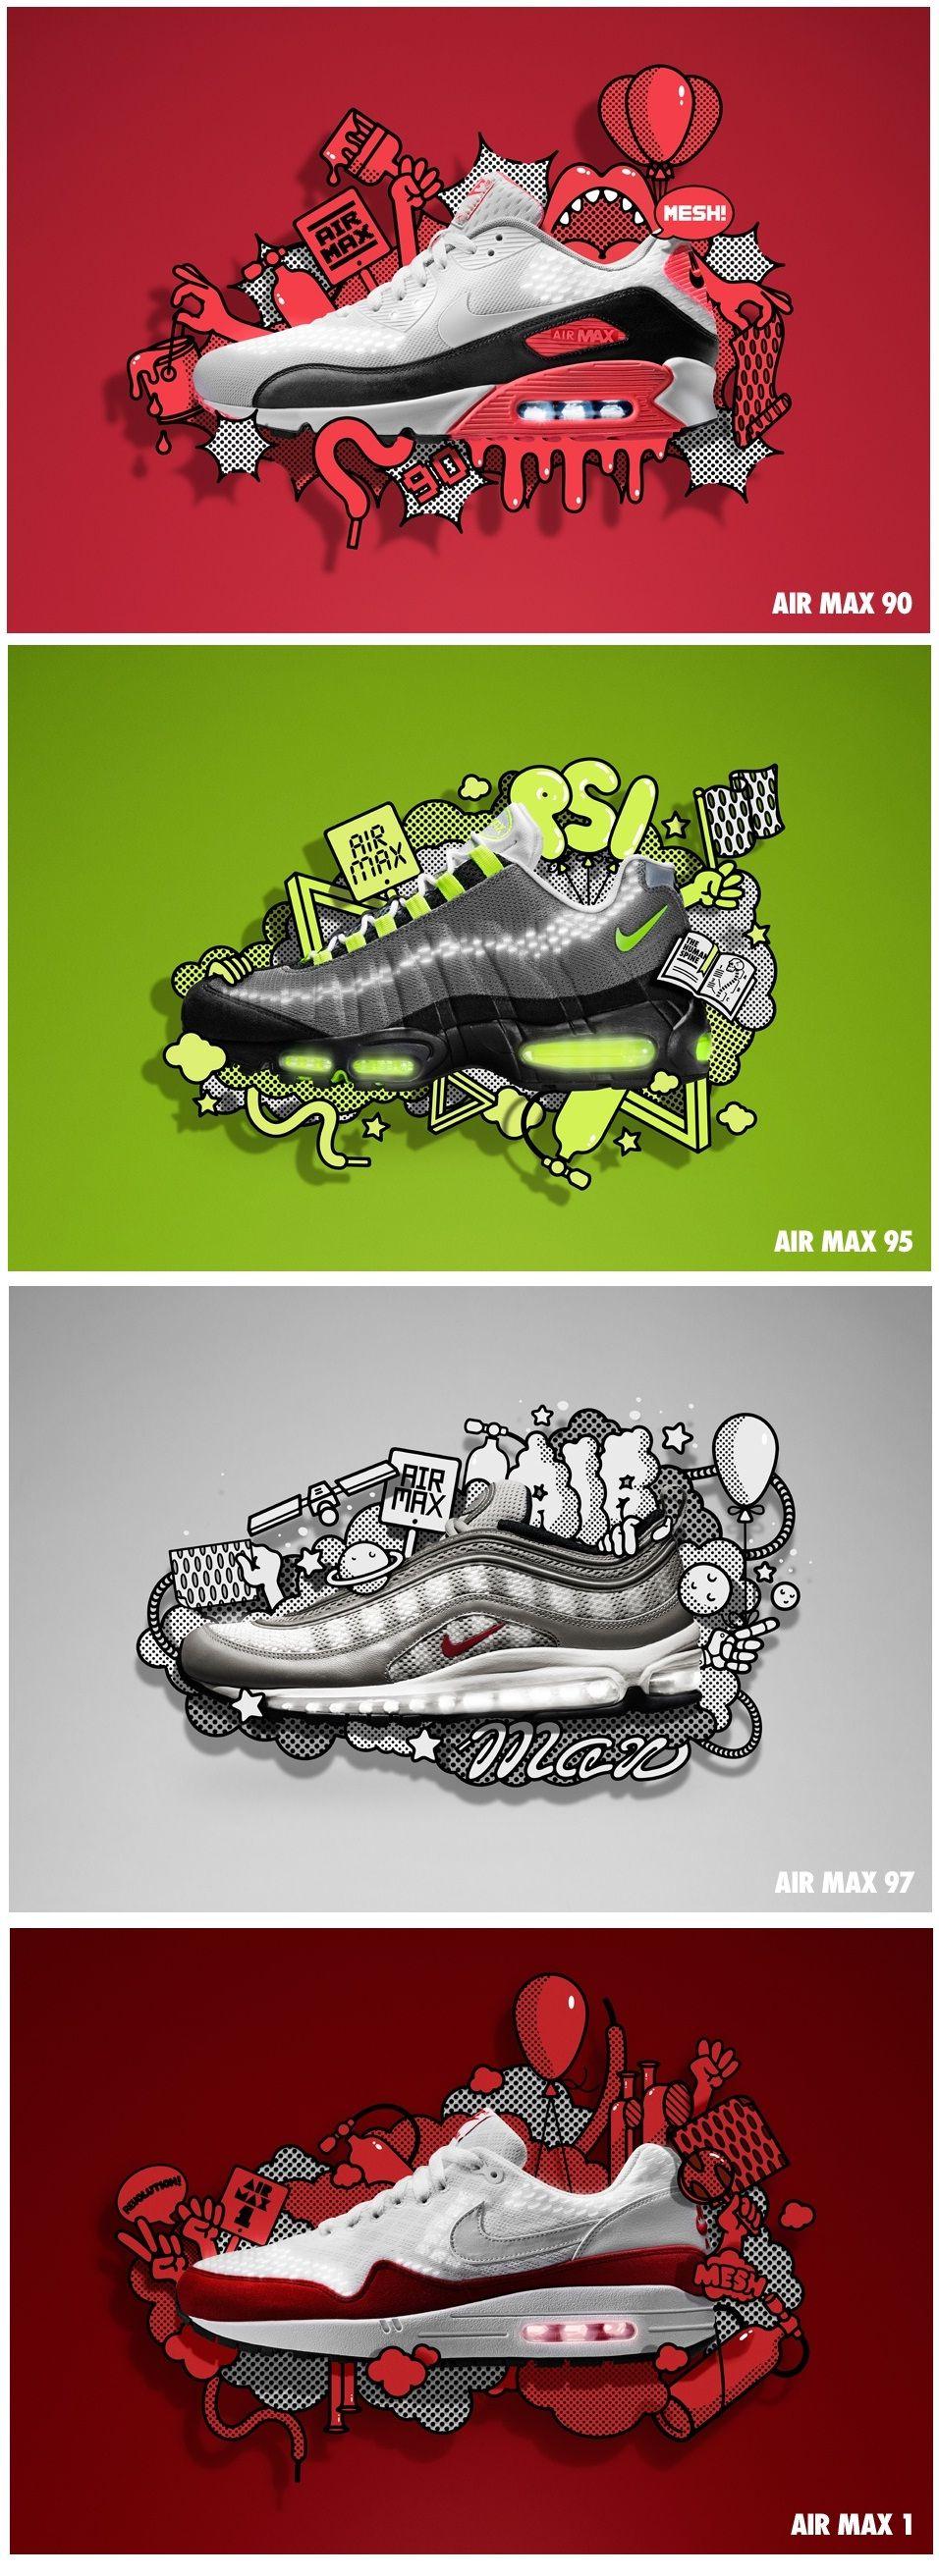 Nike Taiwan Air Max Advert